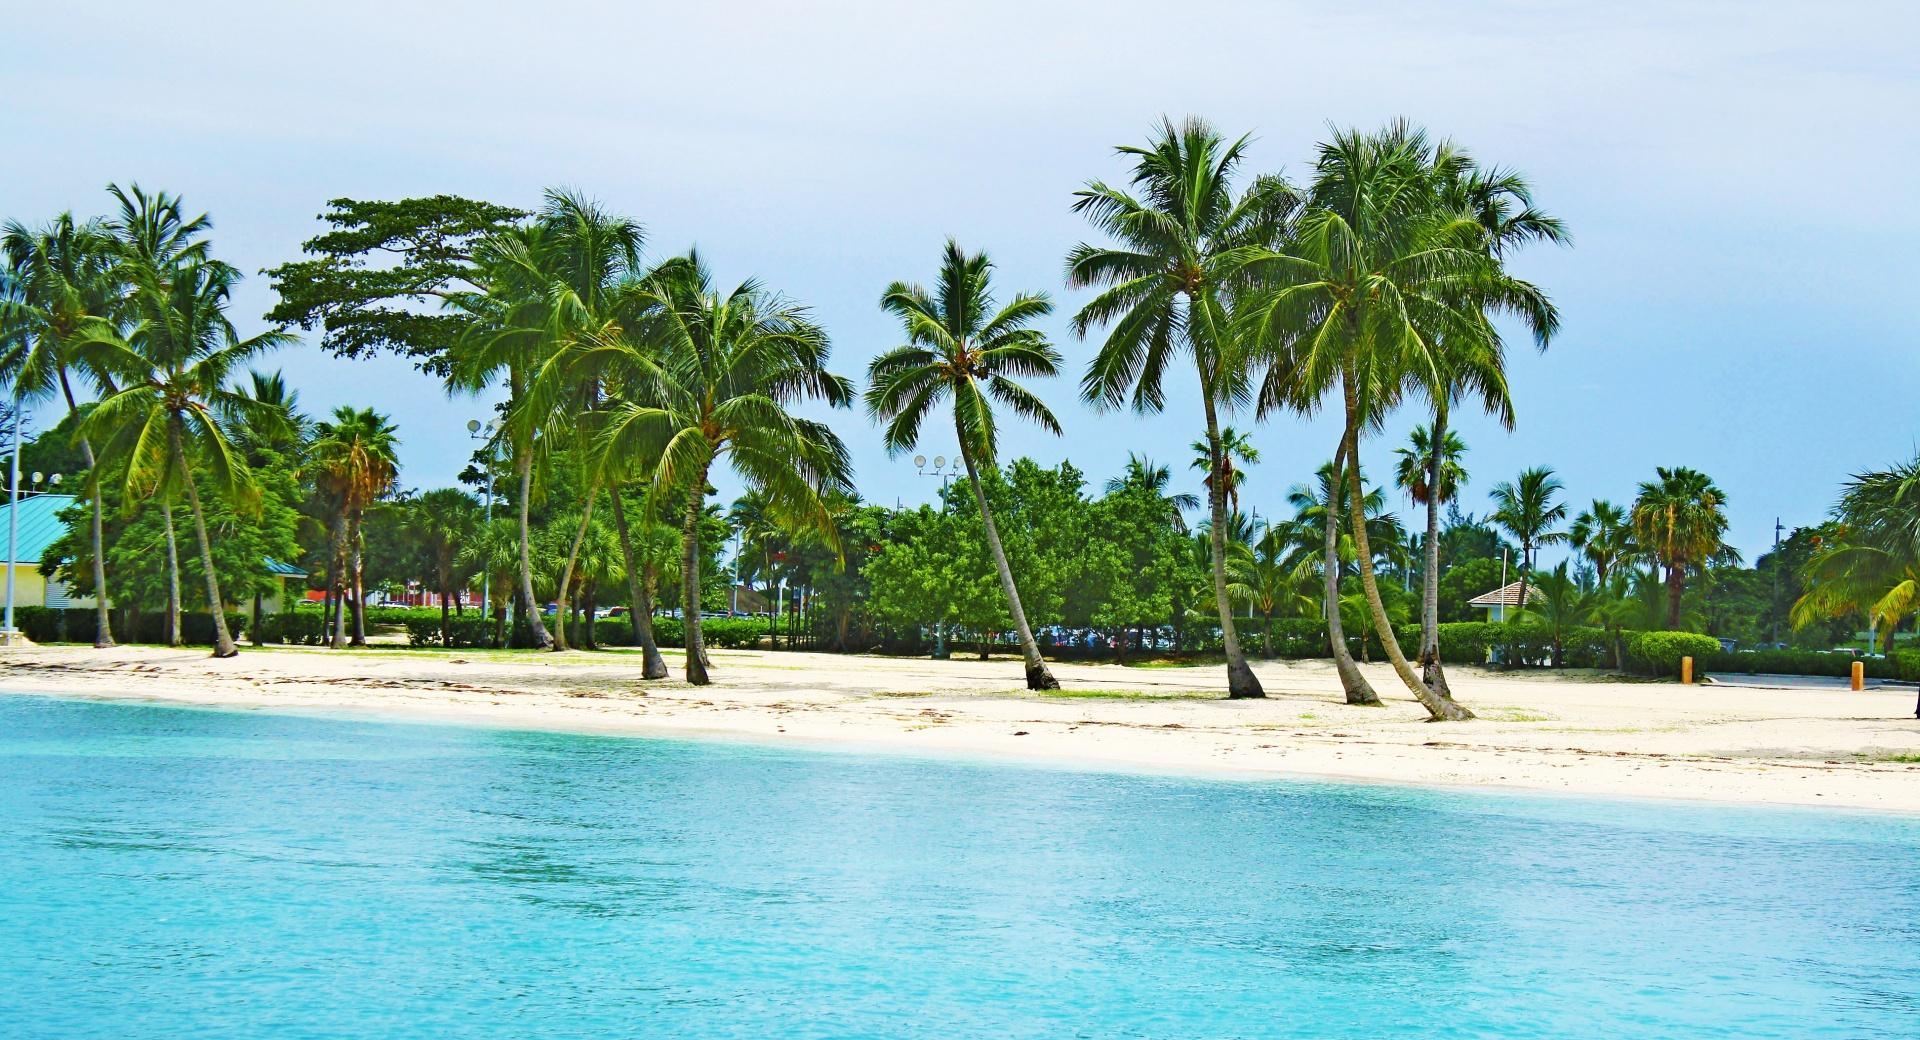 Bahamas Beach wallpapers HD quality